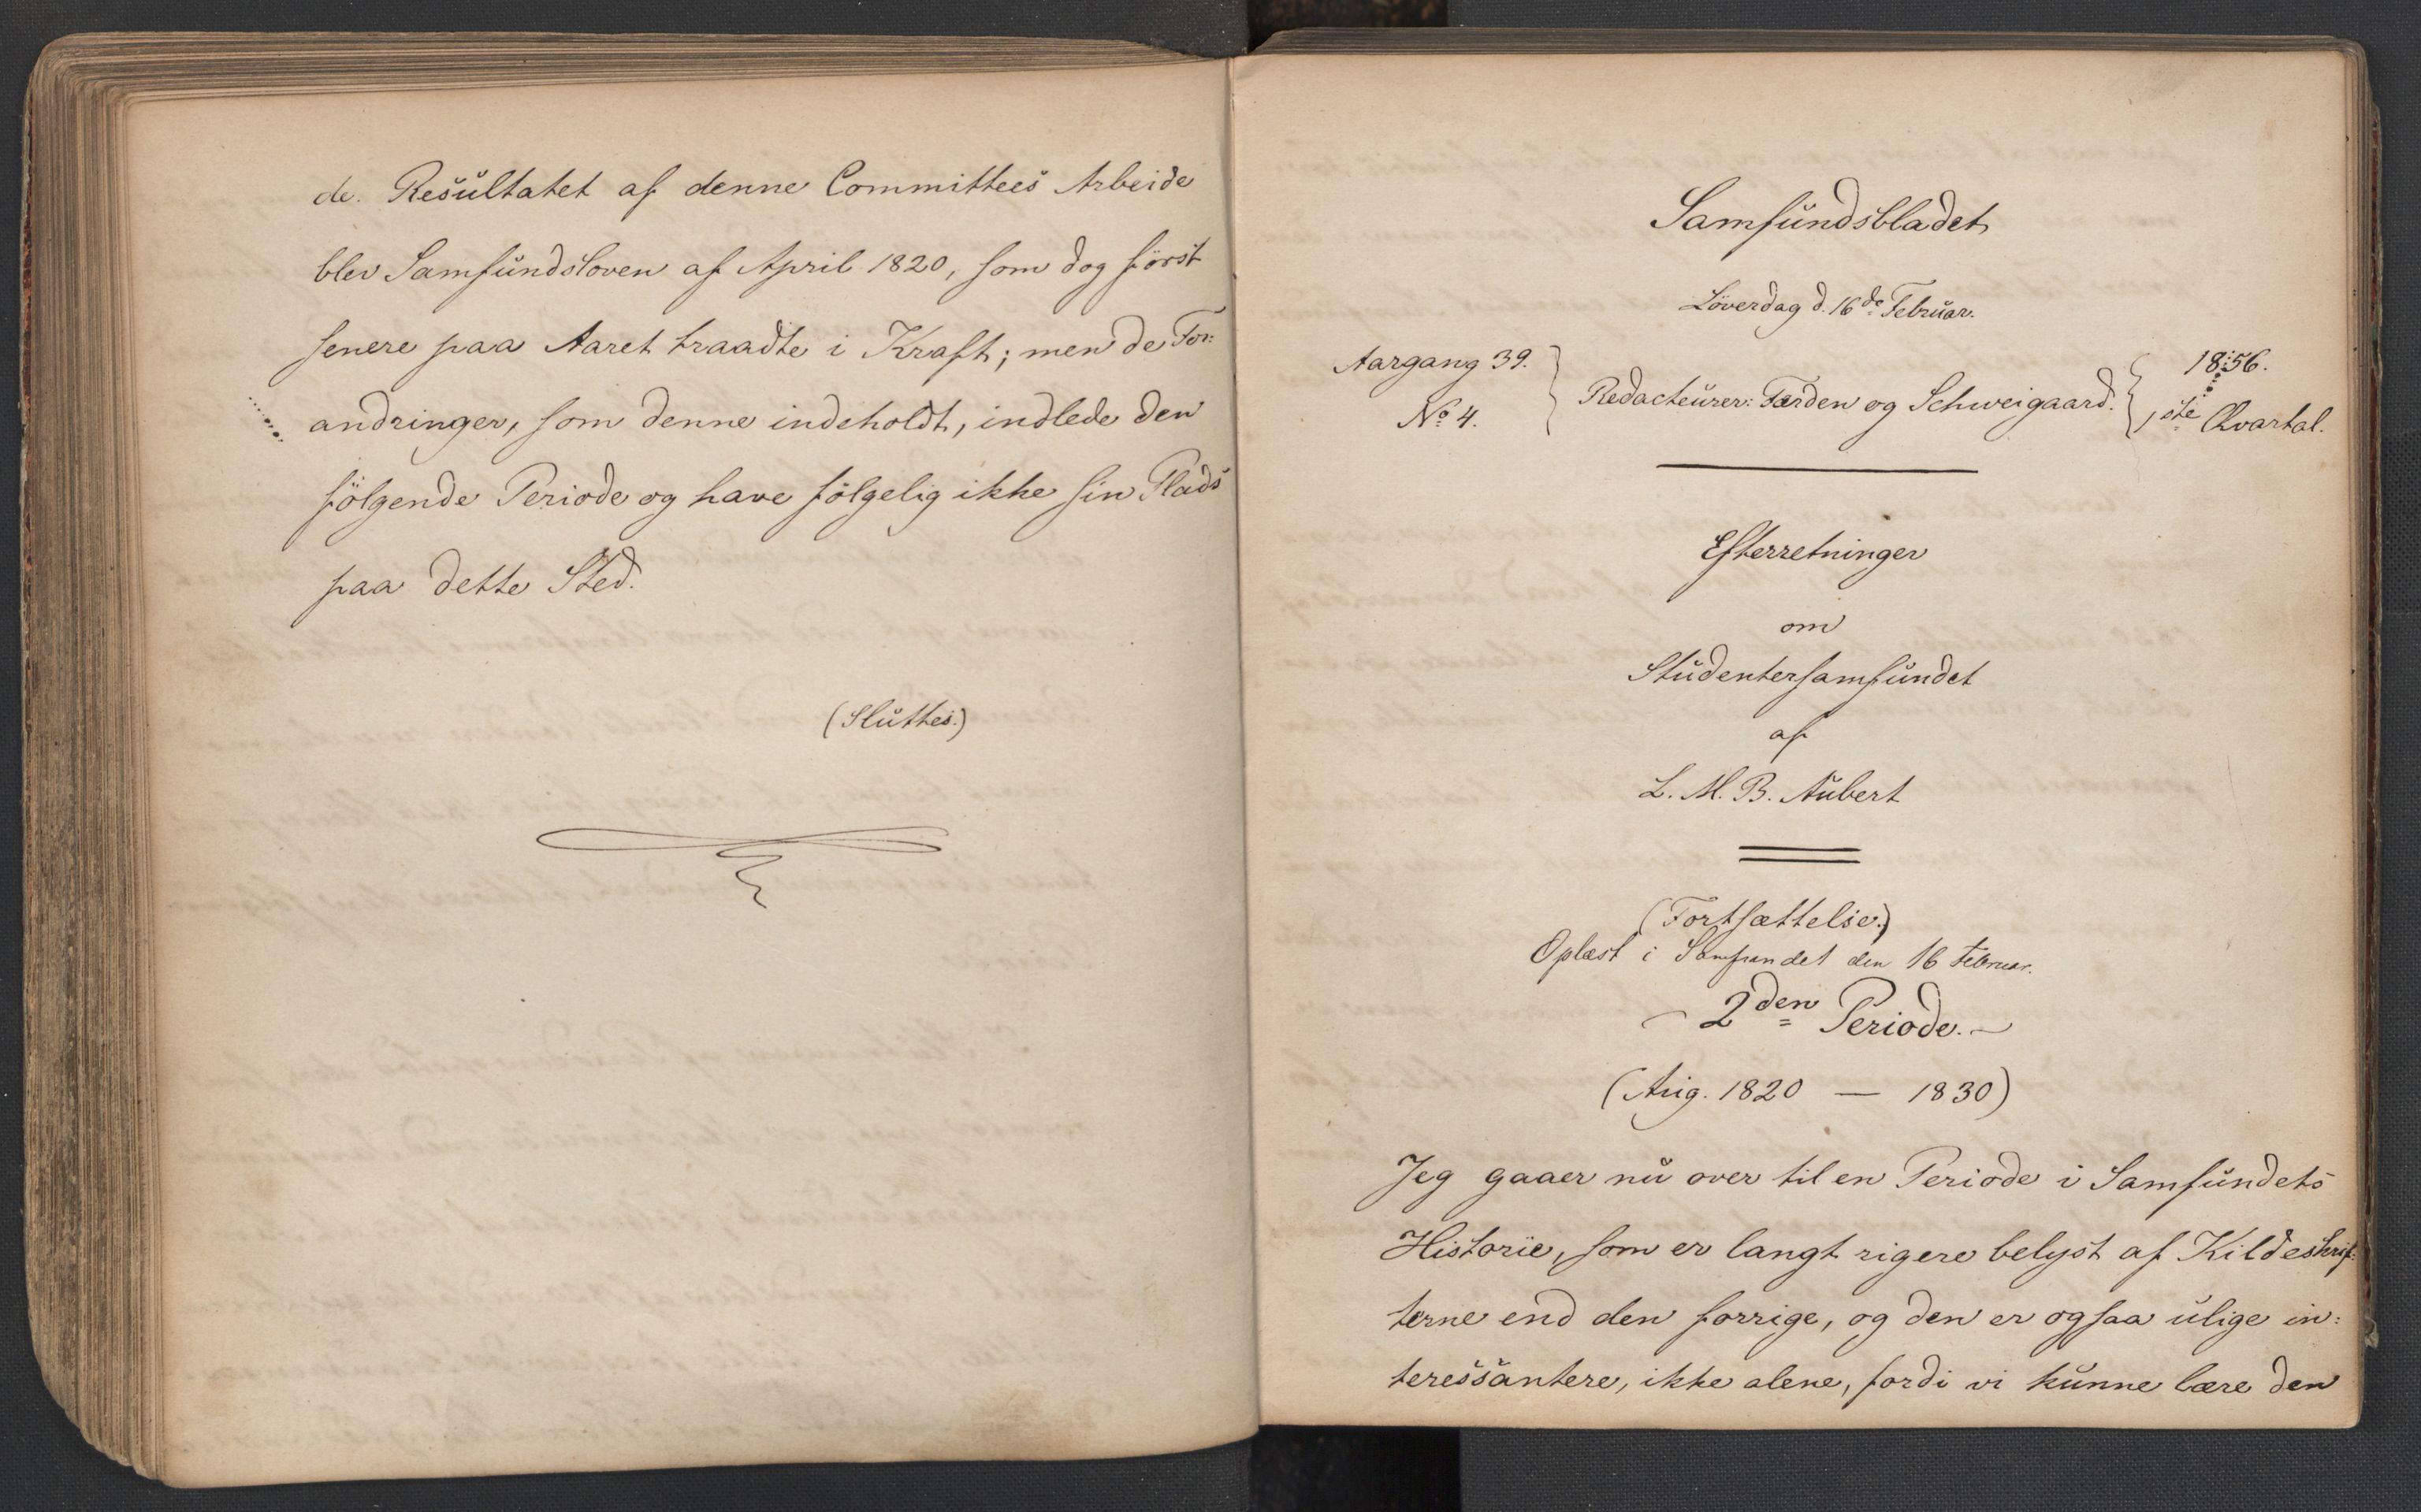 RA, Det Norske Studentersamfund, X/Xa/L0005, 1855-1856, s. 119